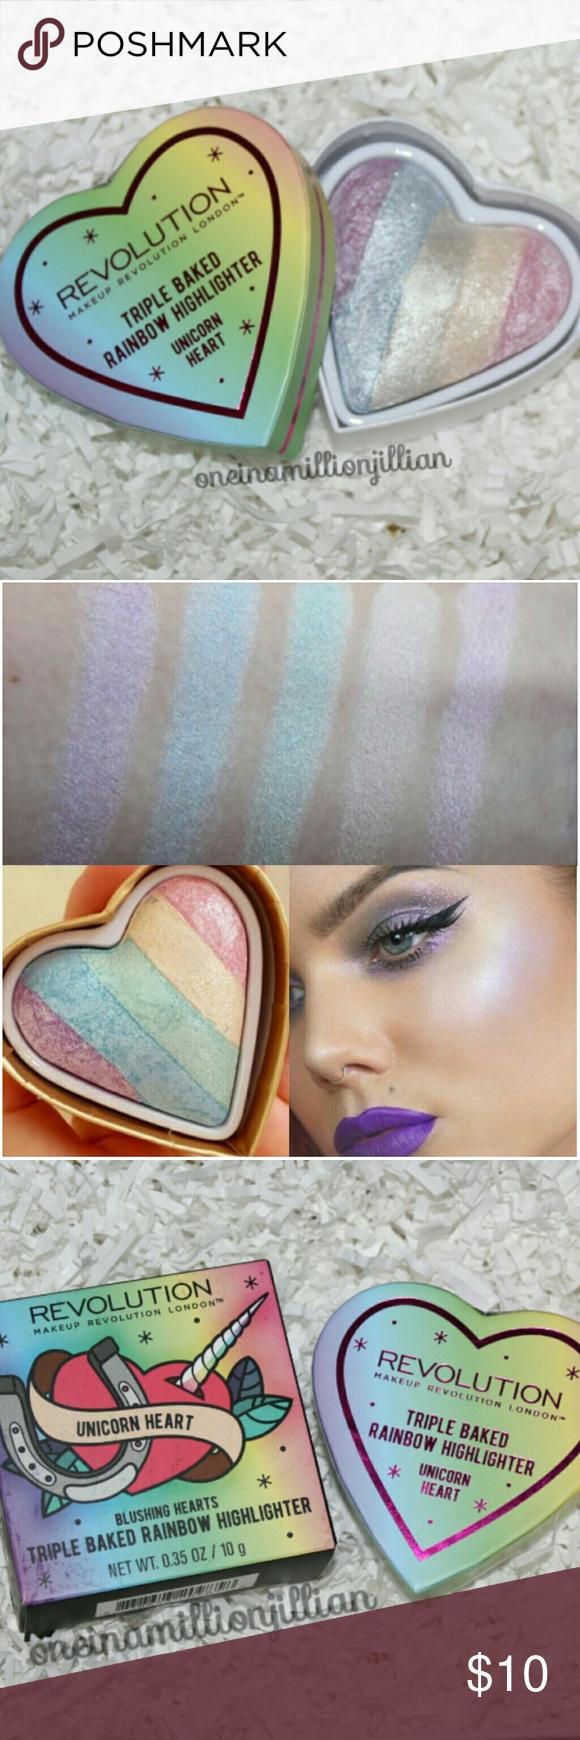 LAST ONE! Makeup Rev Rainbow Highlighting Powder New in